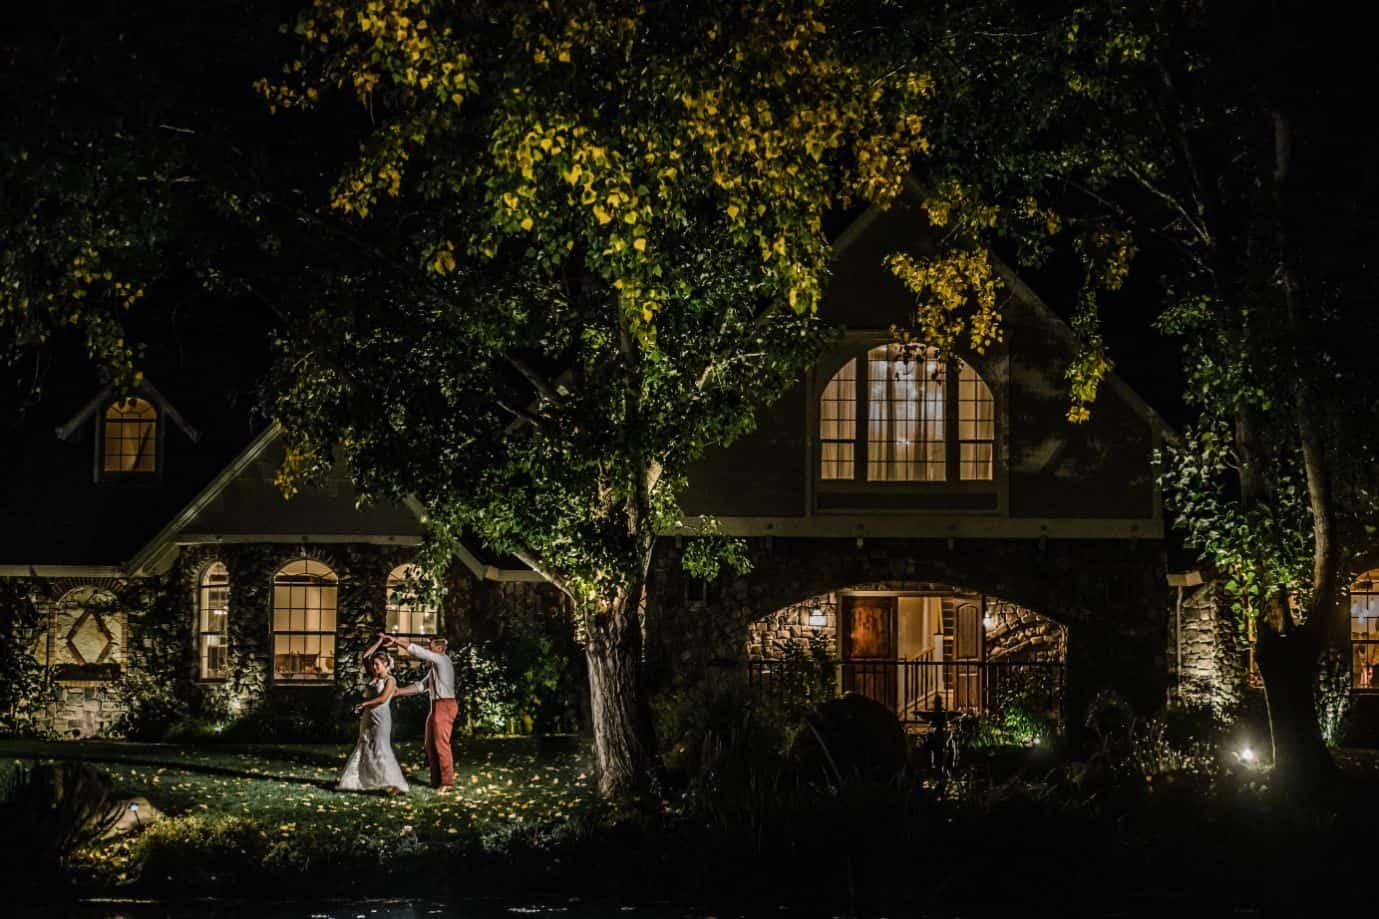 29 photo opportunities rustic mountain house estate weddingi venues northern california